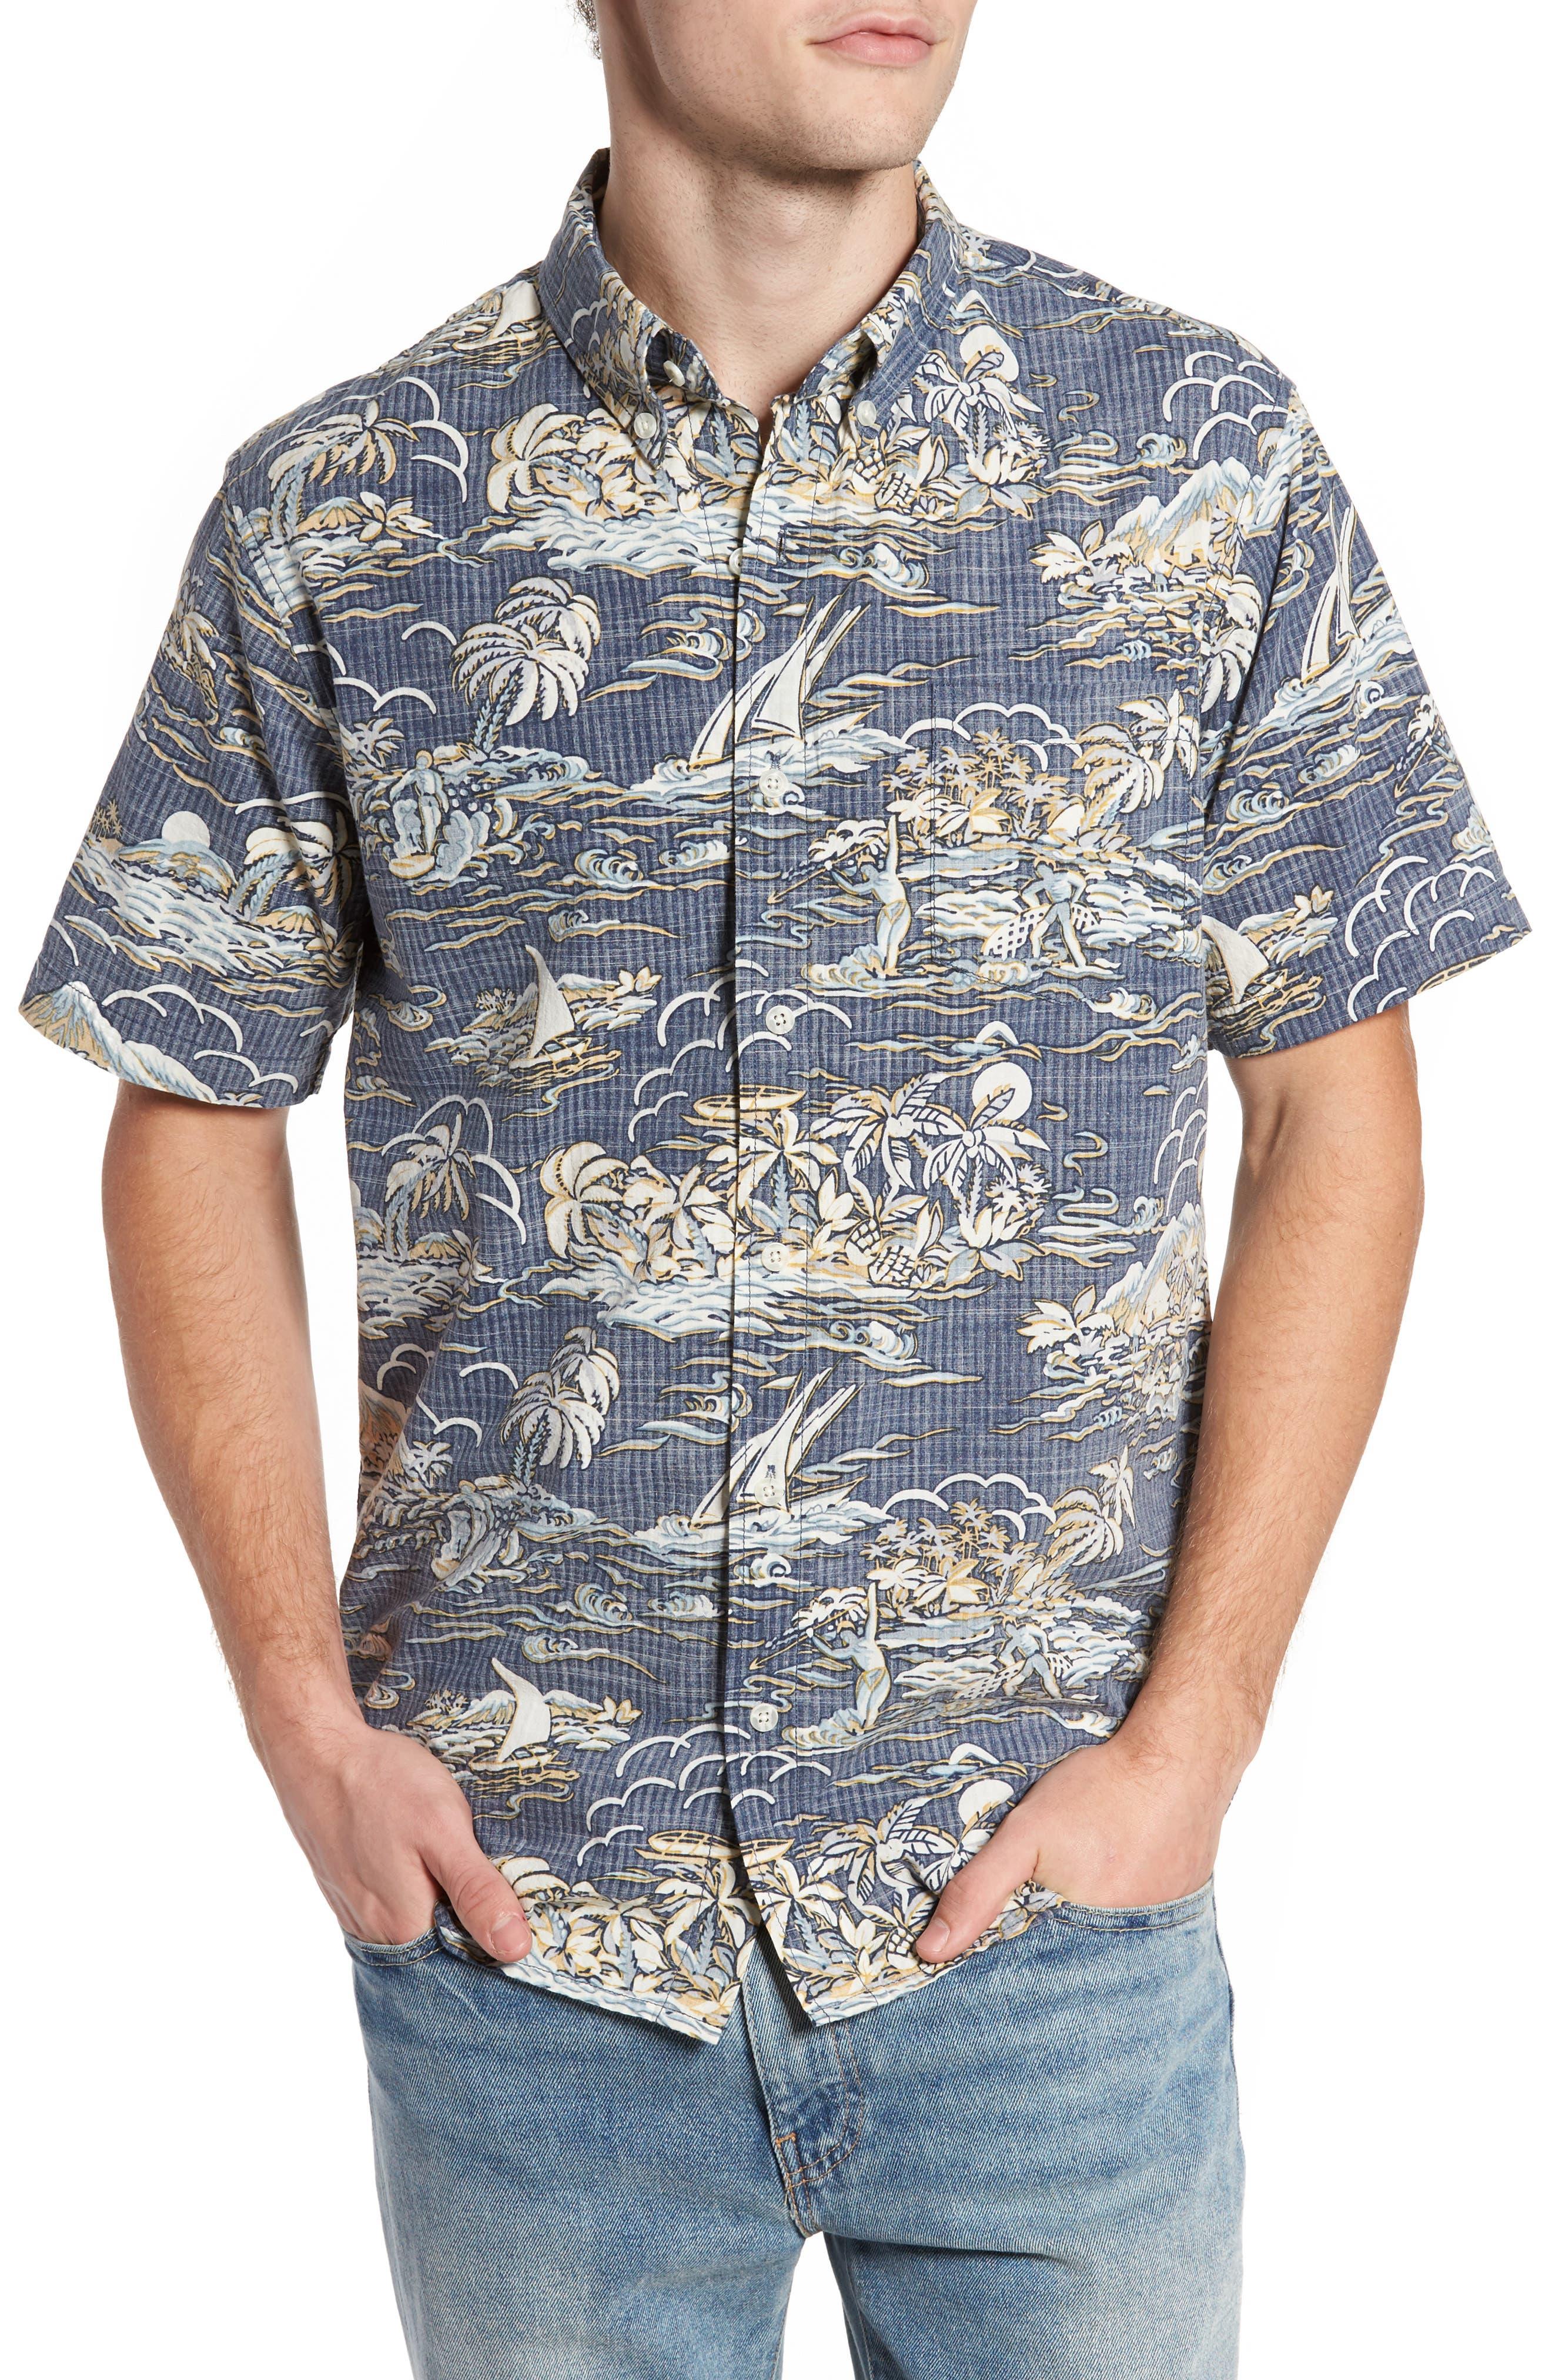 Laupakahi Modern Fit Print Shirt,                             Main thumbnail 1, color,                             410